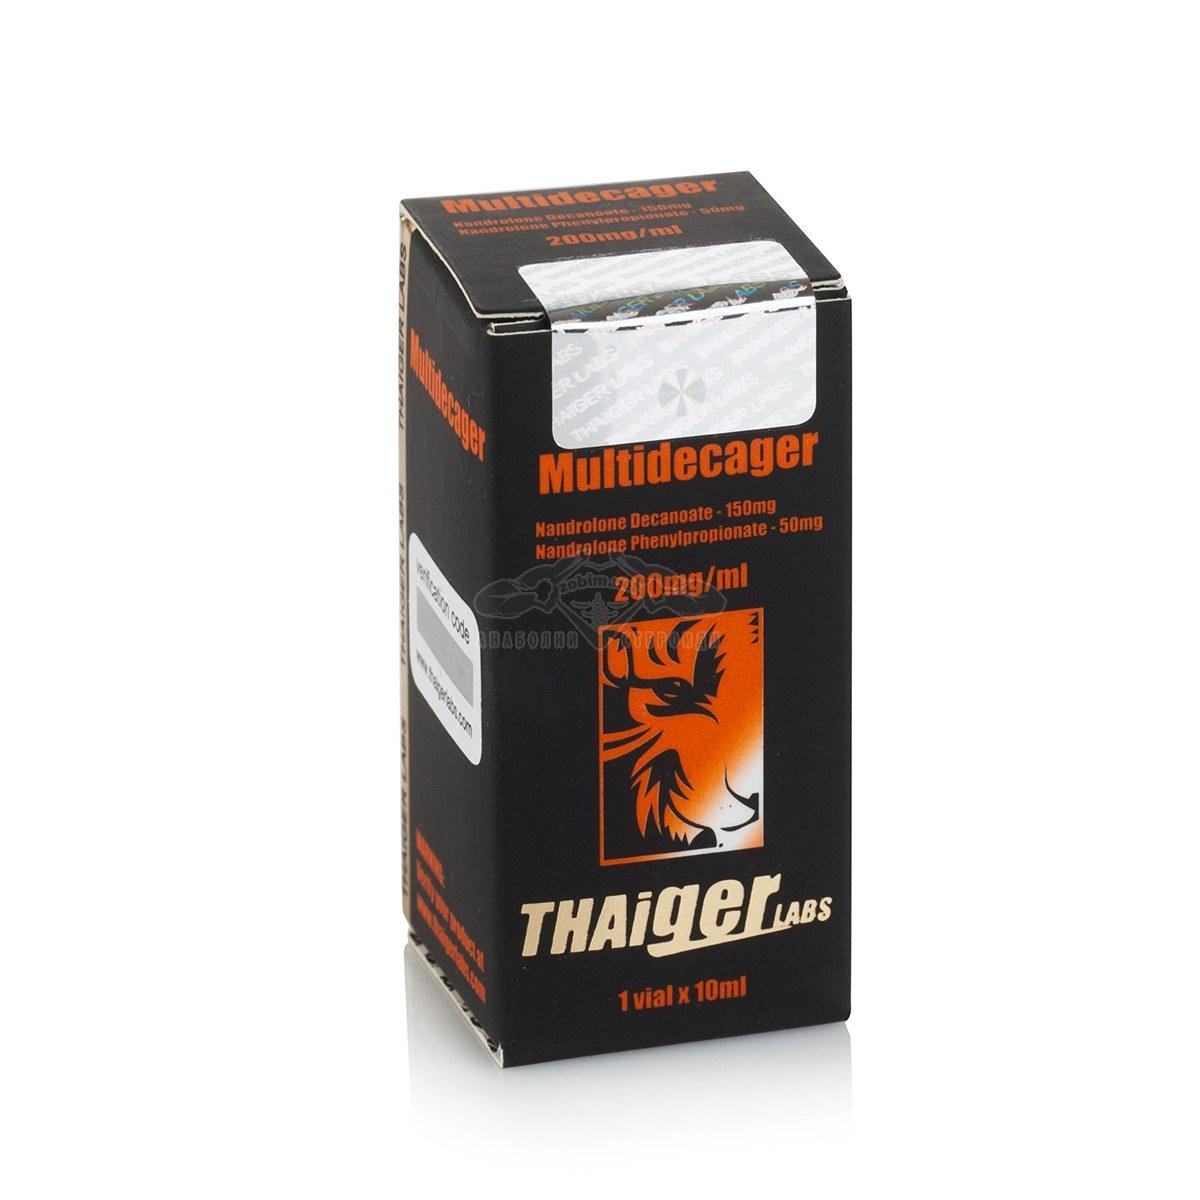 Multidecager (Nandrolone Decanoate, Nandrolone Phenylopropionate) – 10 мл. х 200 мг.